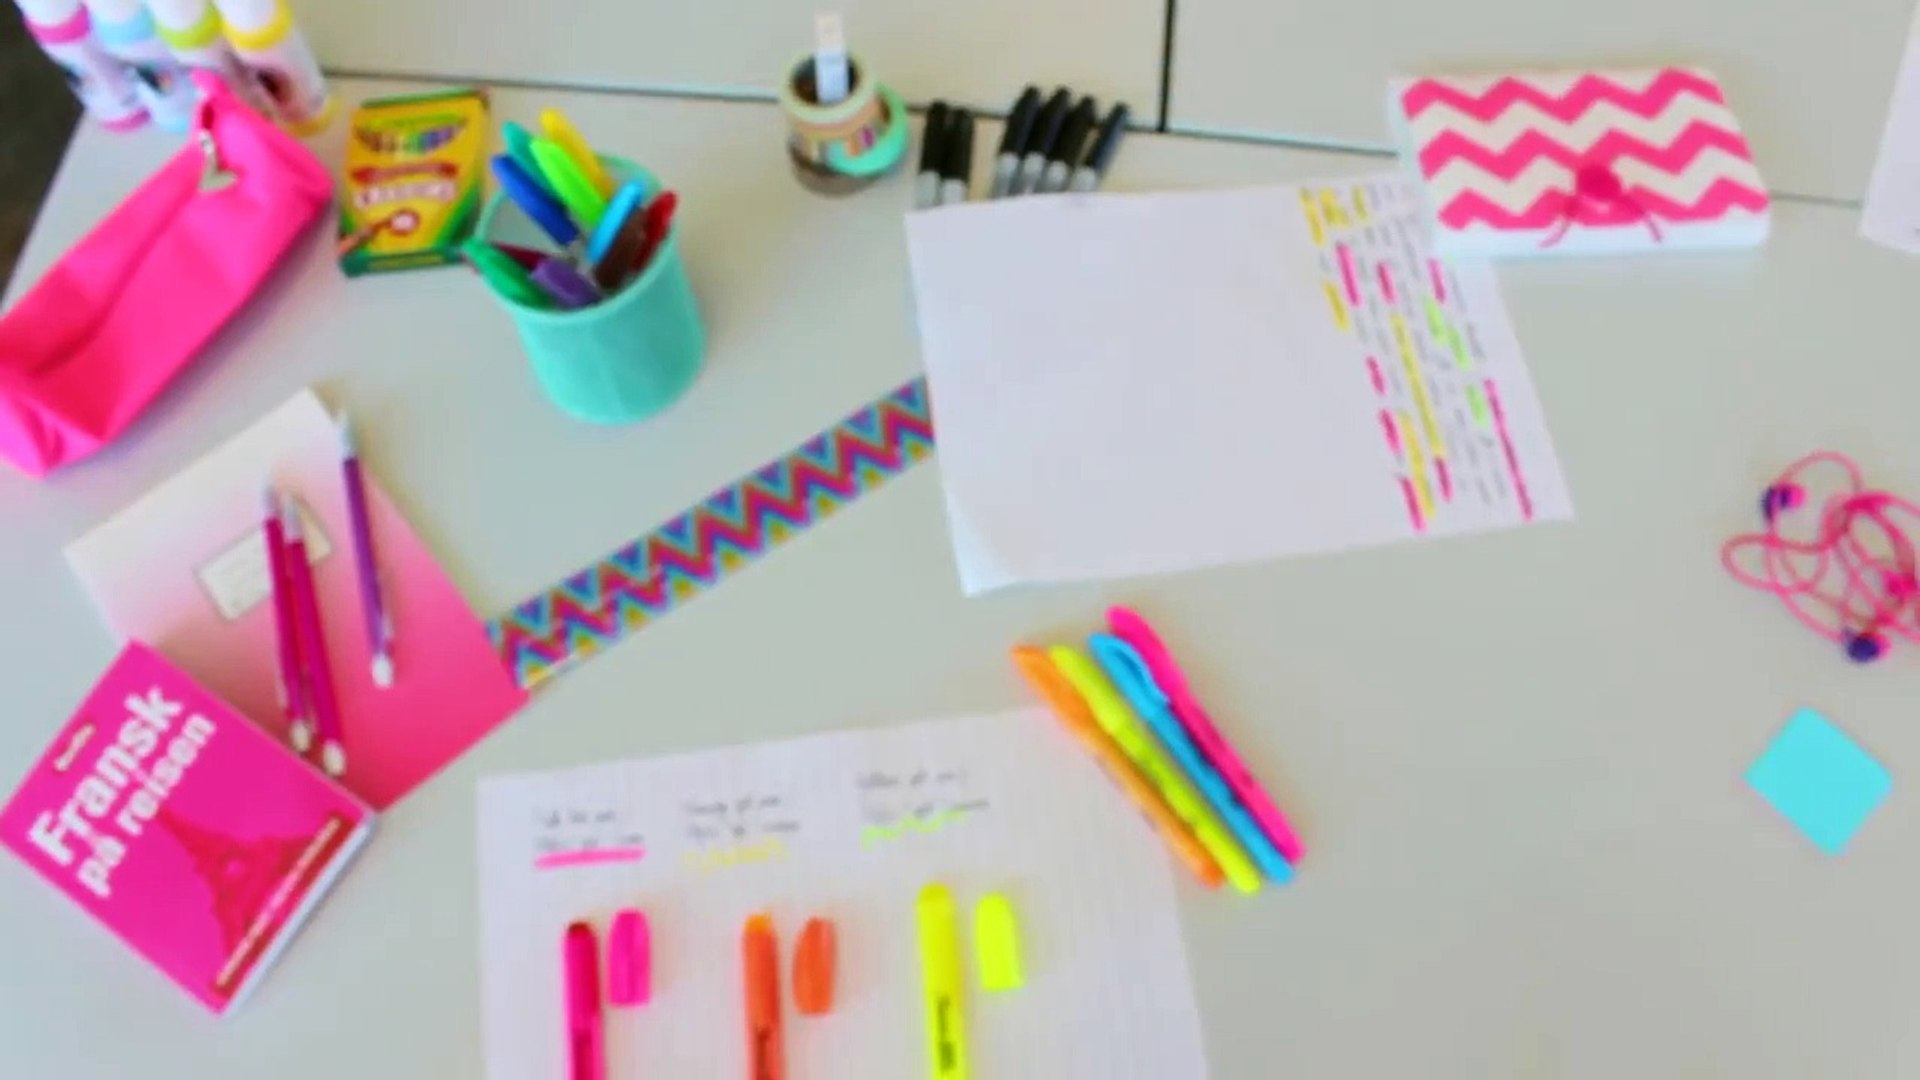 Back to school: Study tips + Organization tips!